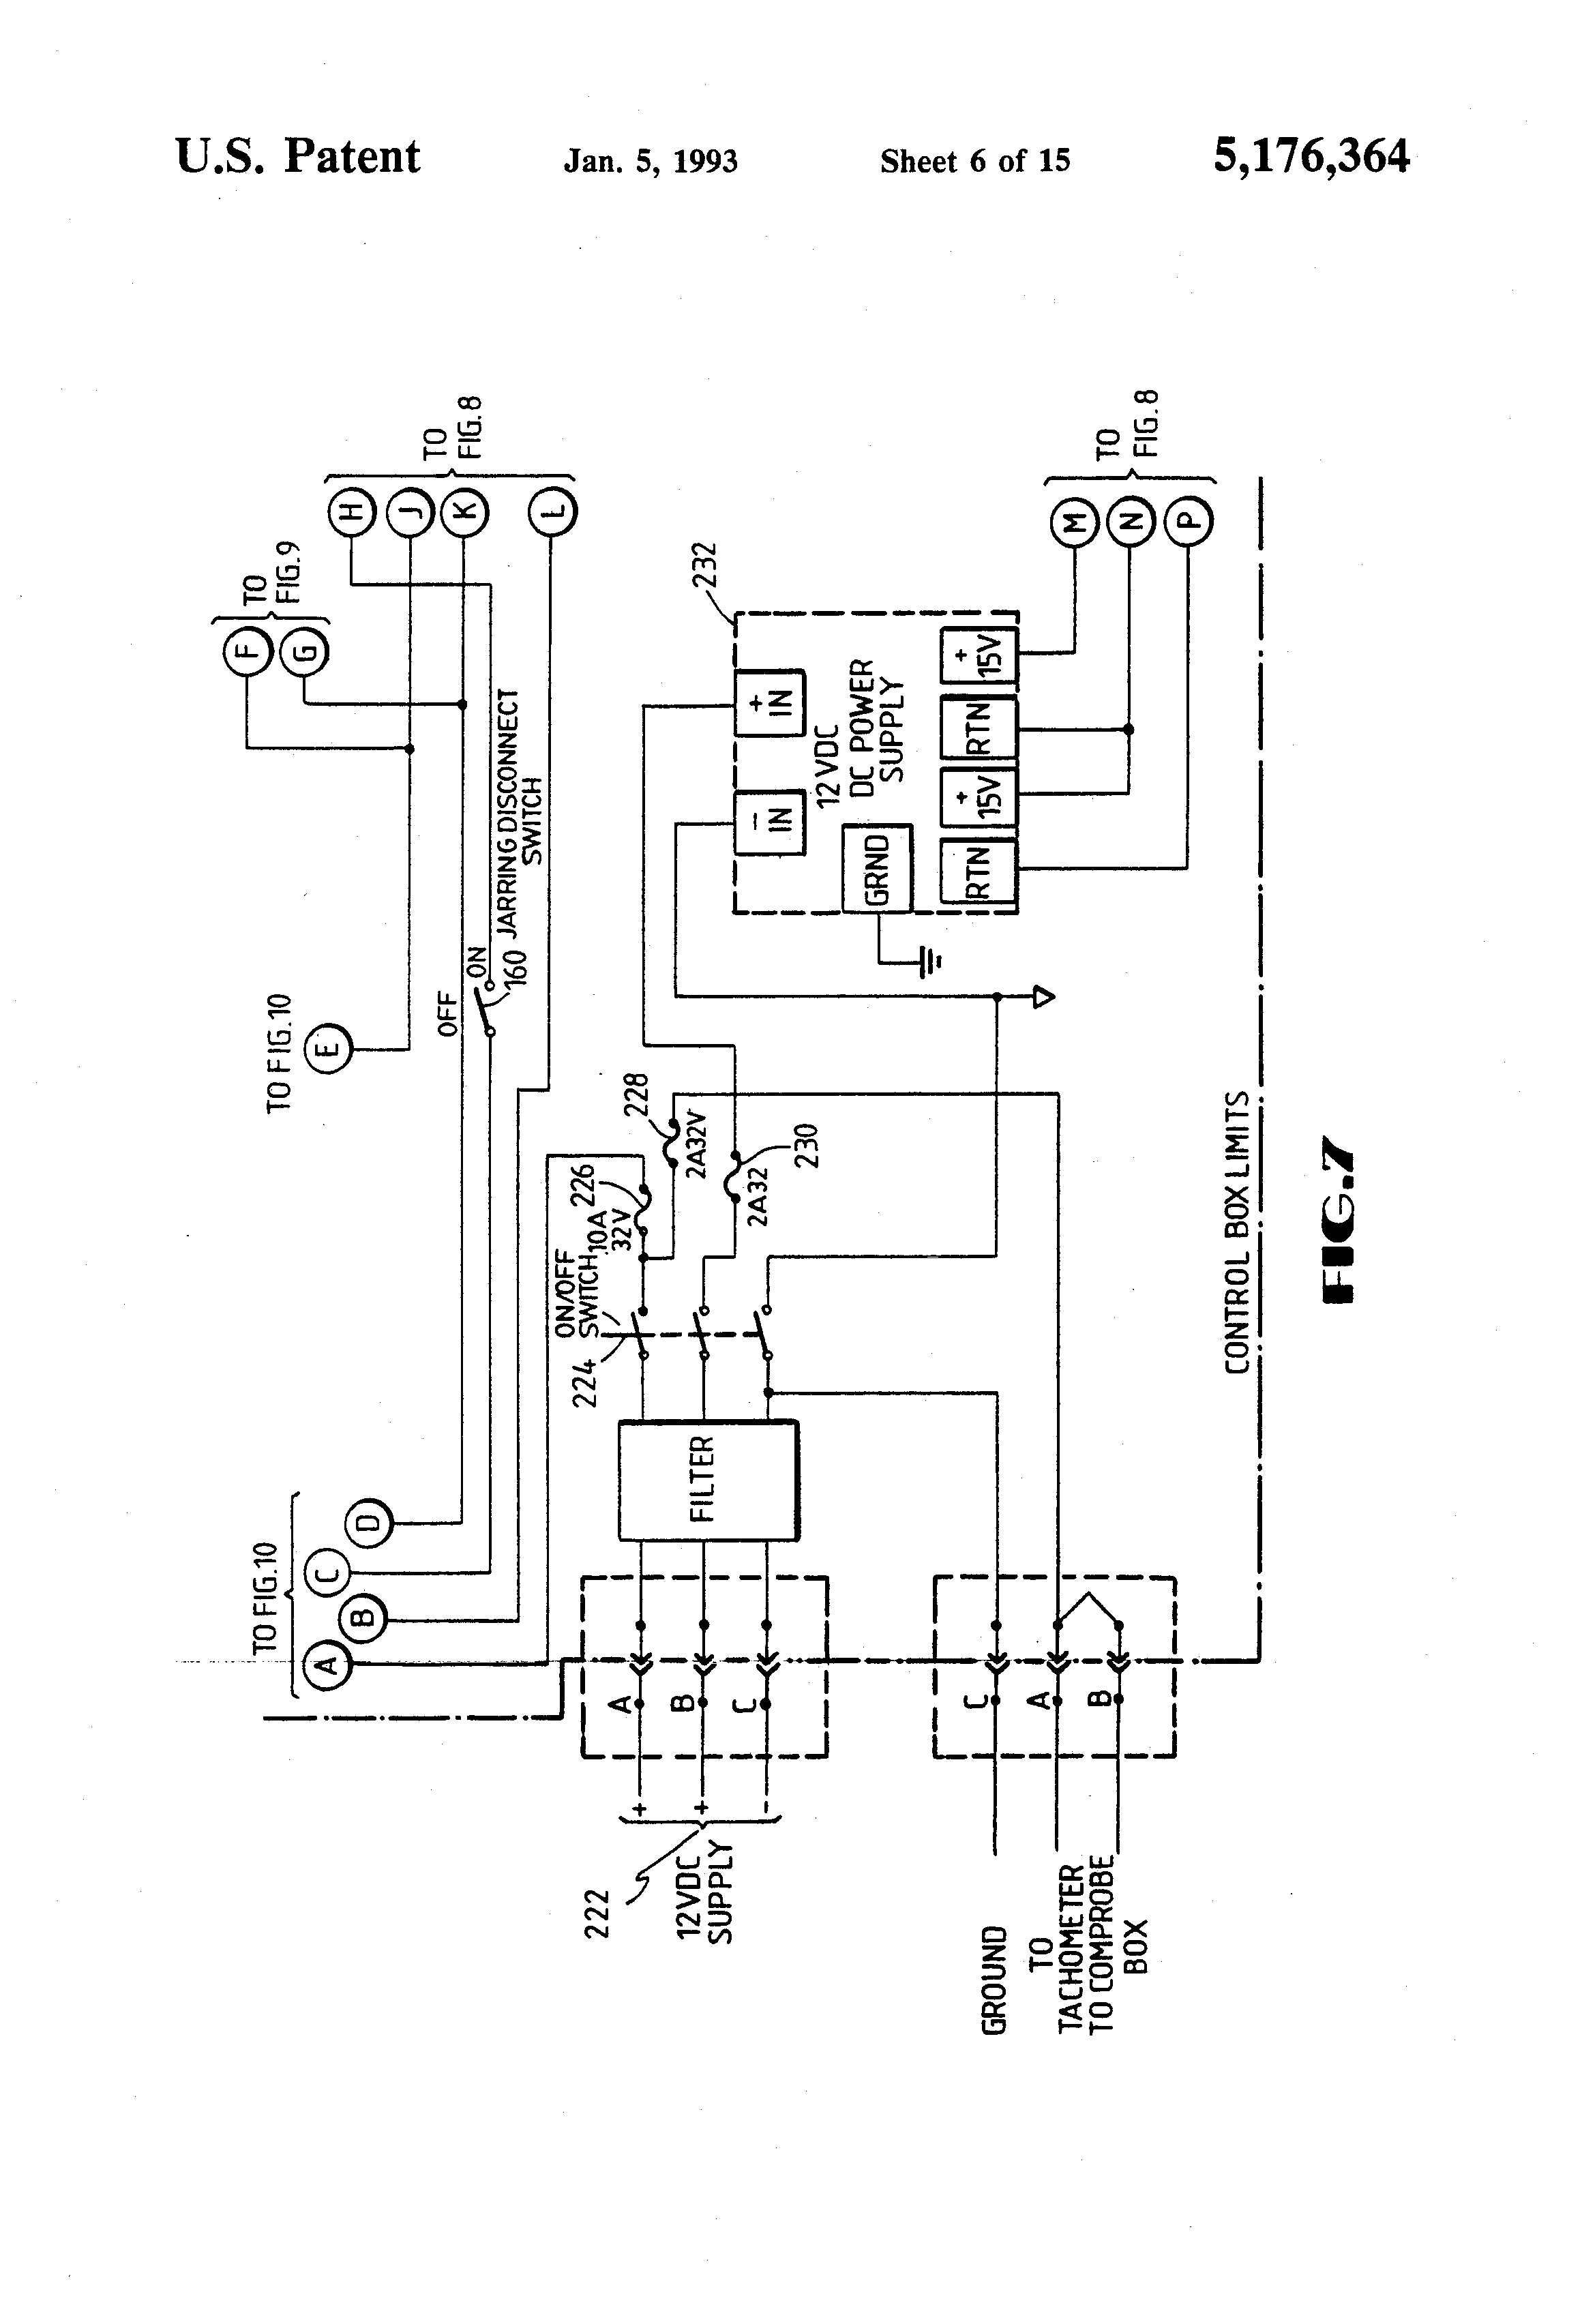 Trakker Winch Wiring Diagram. Wiring. Wiring Diagrams Instructions